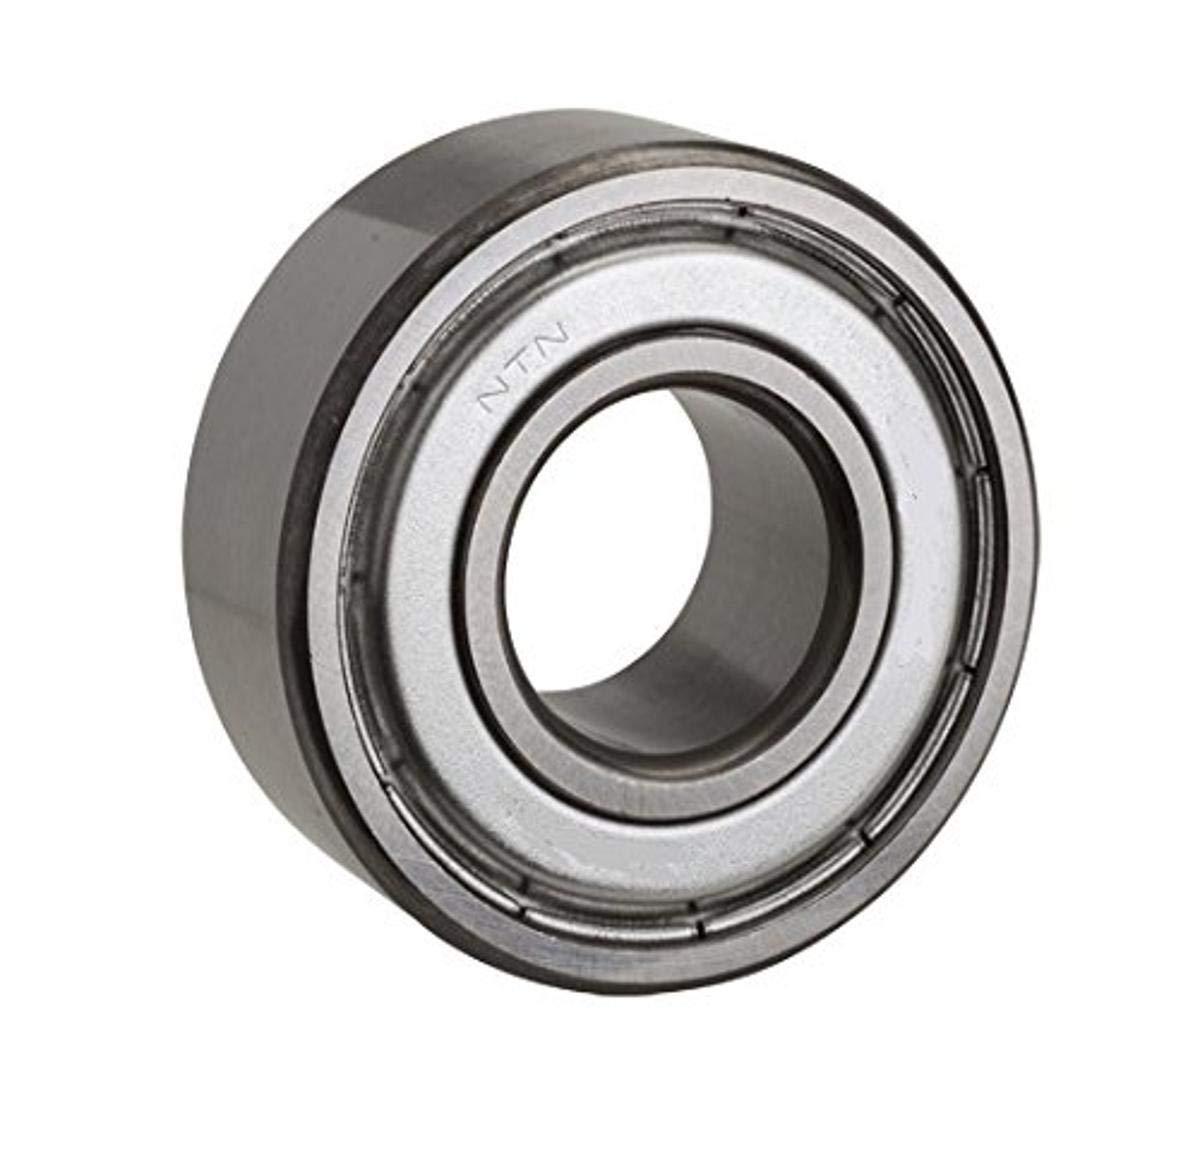 Steel Cage 120 mm OD Open NTN   BL213C3 65 mm Bore ID Maximum Capacity Type 23 mm Width C3 Clearance NTN Bearing BL213C3 Single Row Deep Groove Radial Ball Bearing